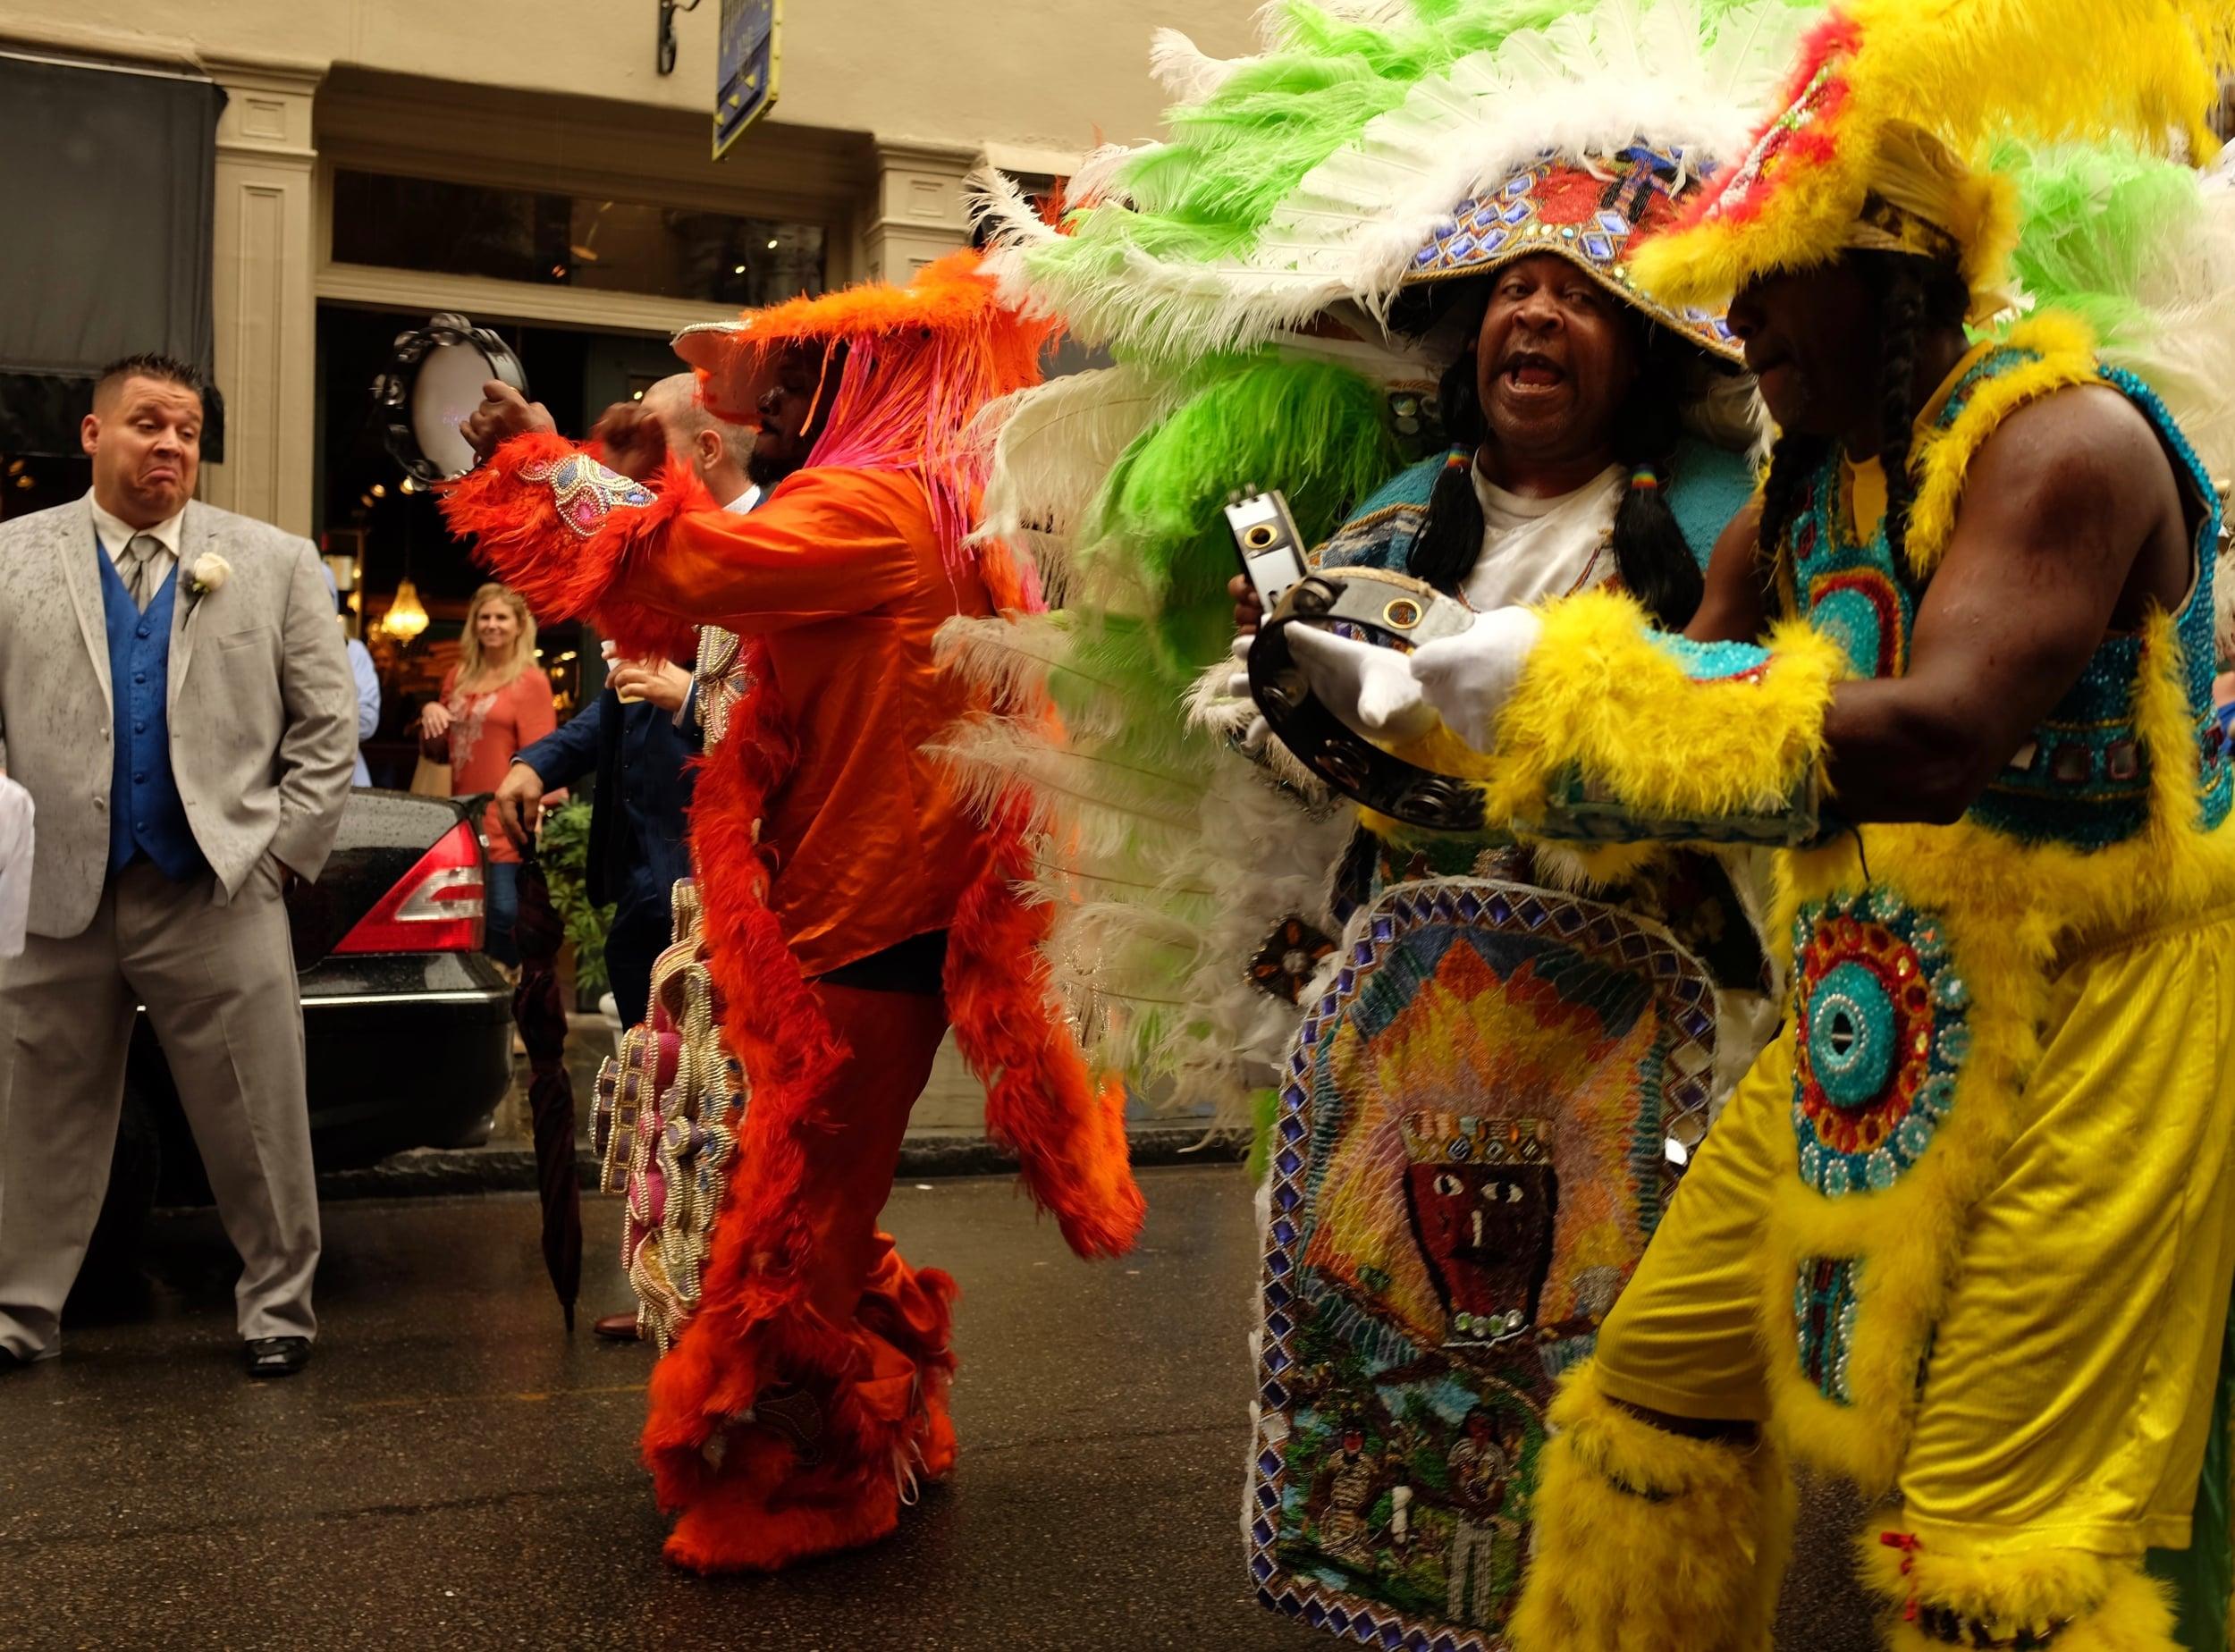 Mardi Gras Indians leading a wedding party, Royal Street, French Quarter.November 21, 2015.